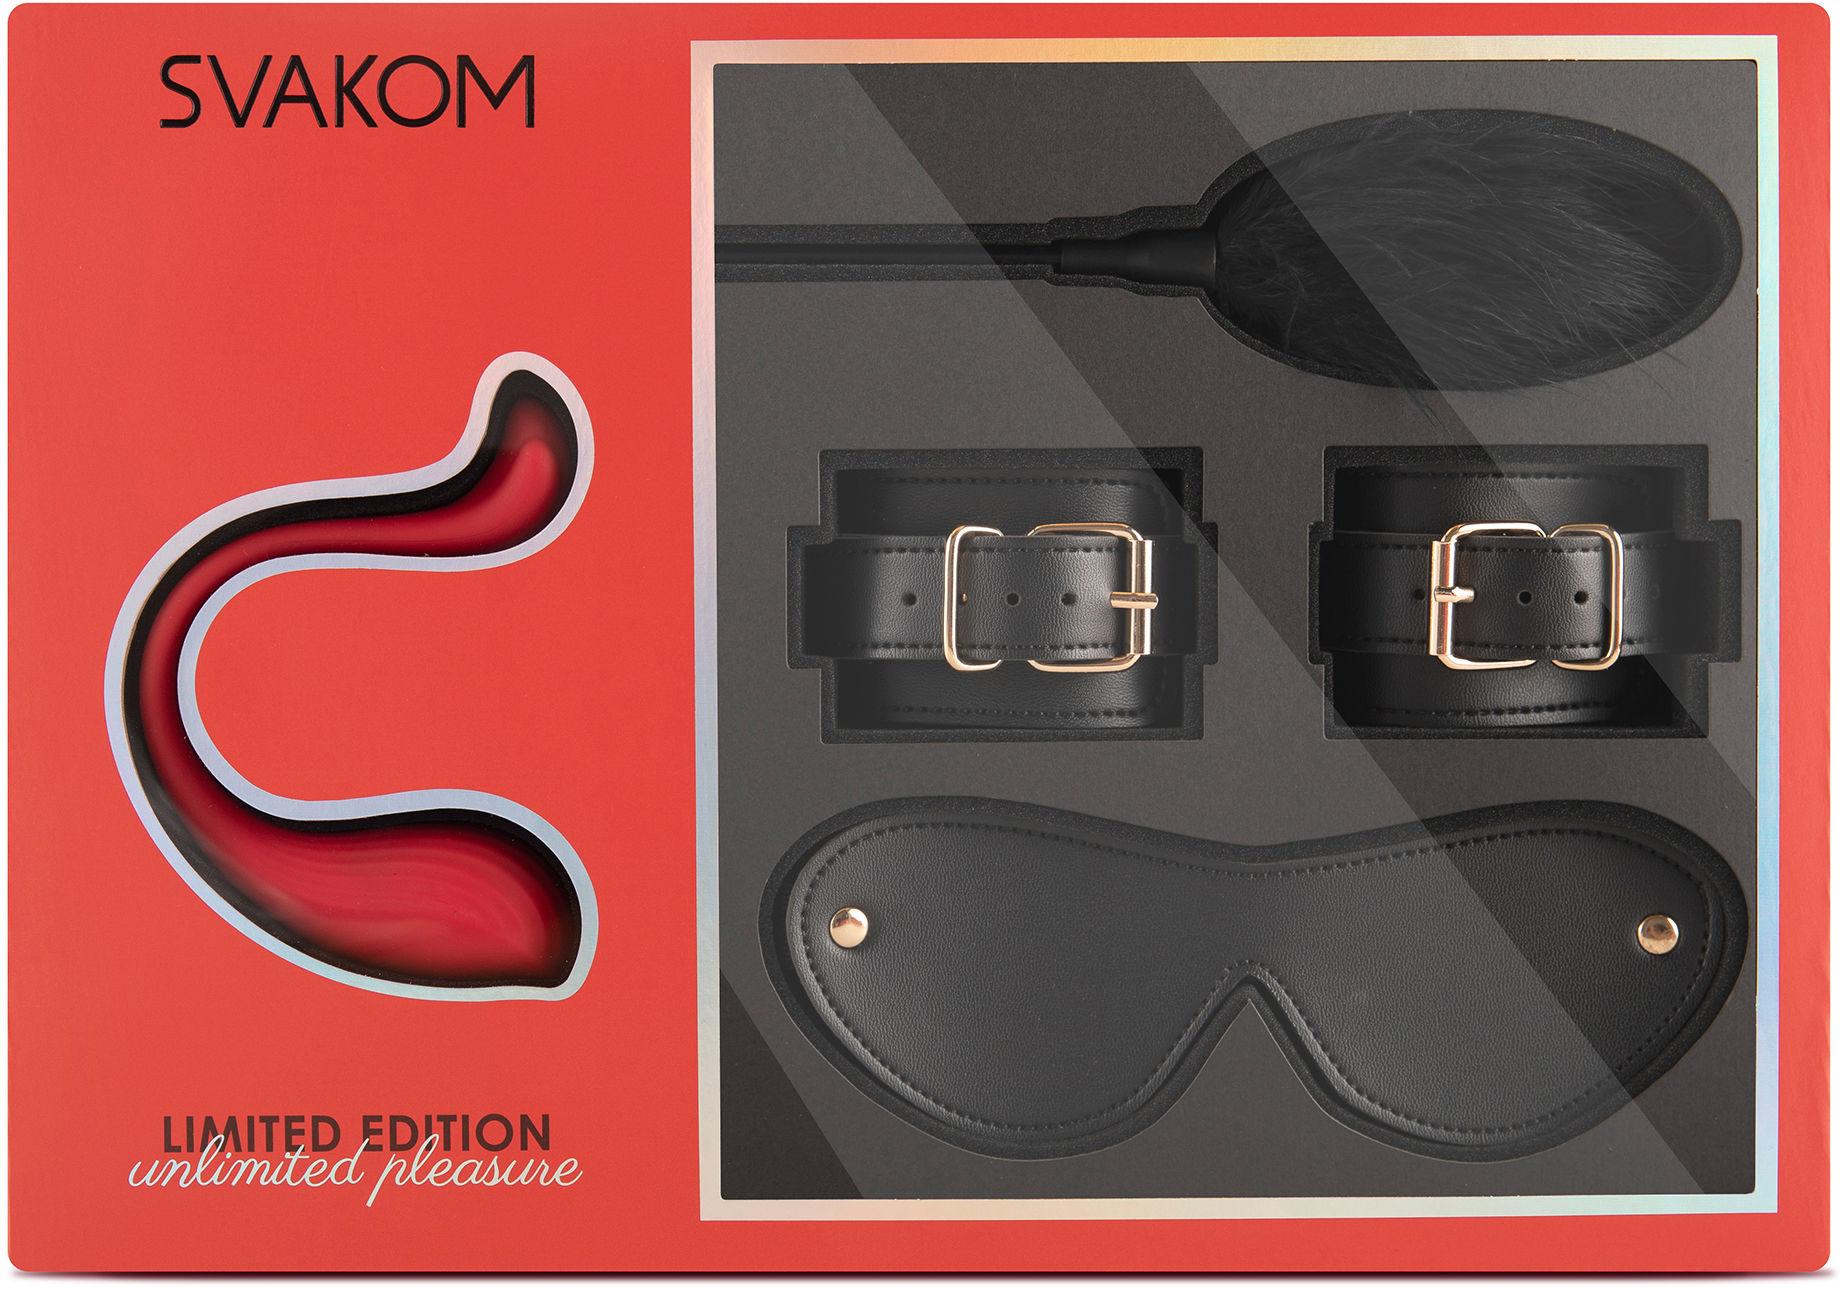 Svakom Limited Kit Gift Box